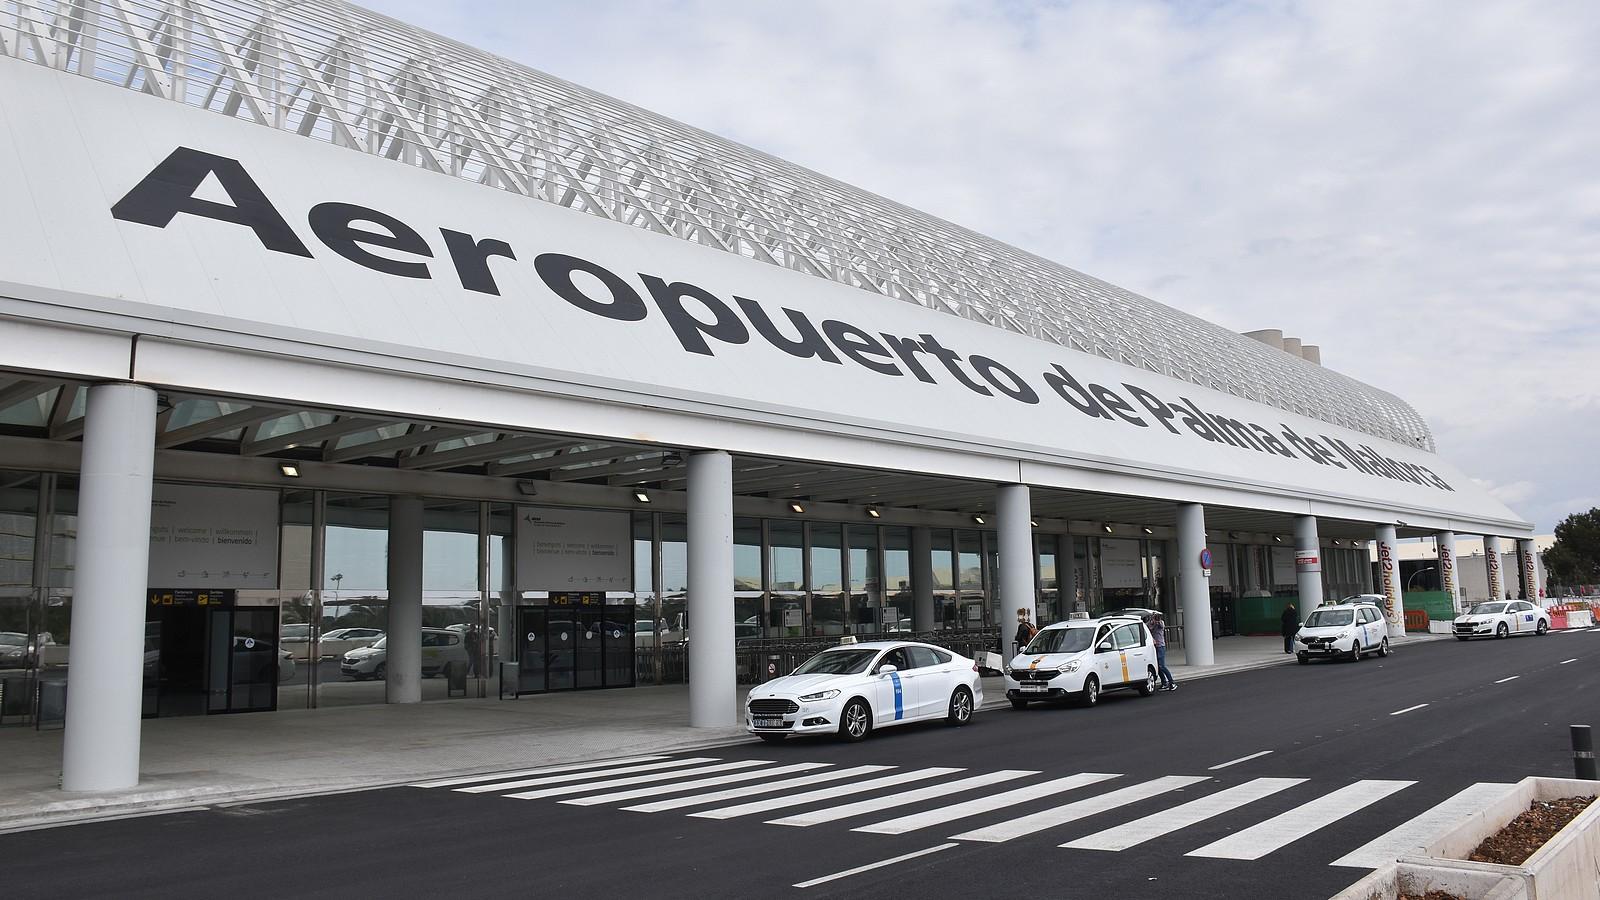 Airport auf Mallorca